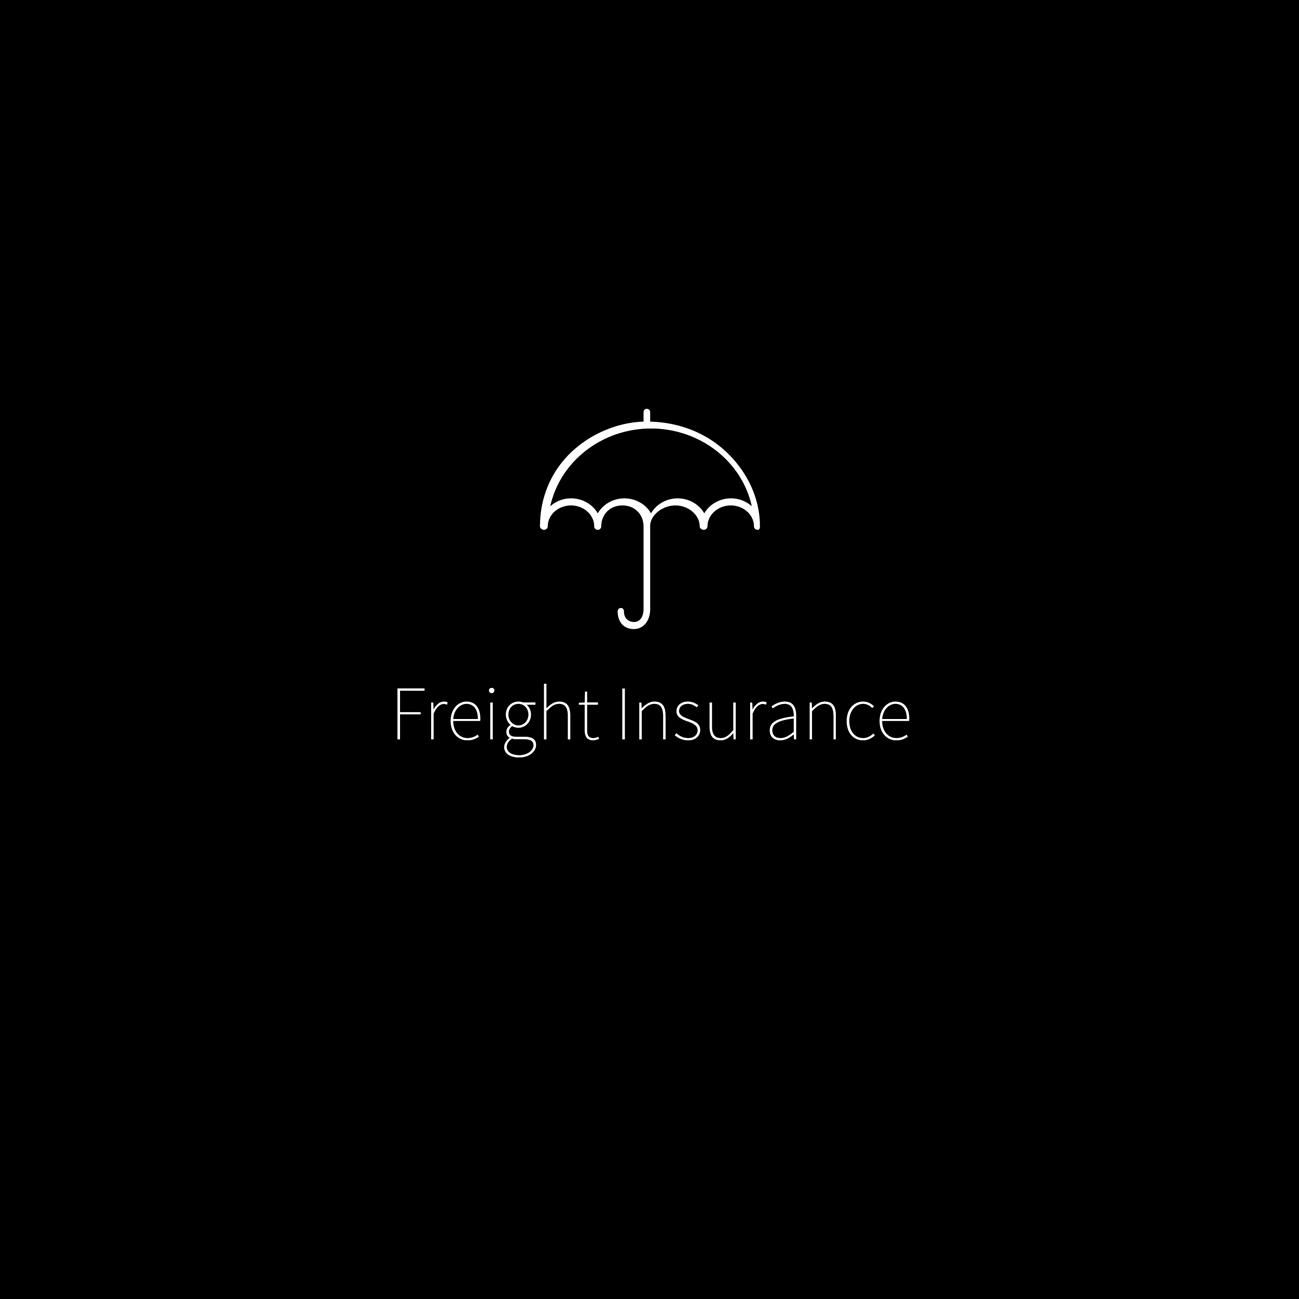 freight-insurance